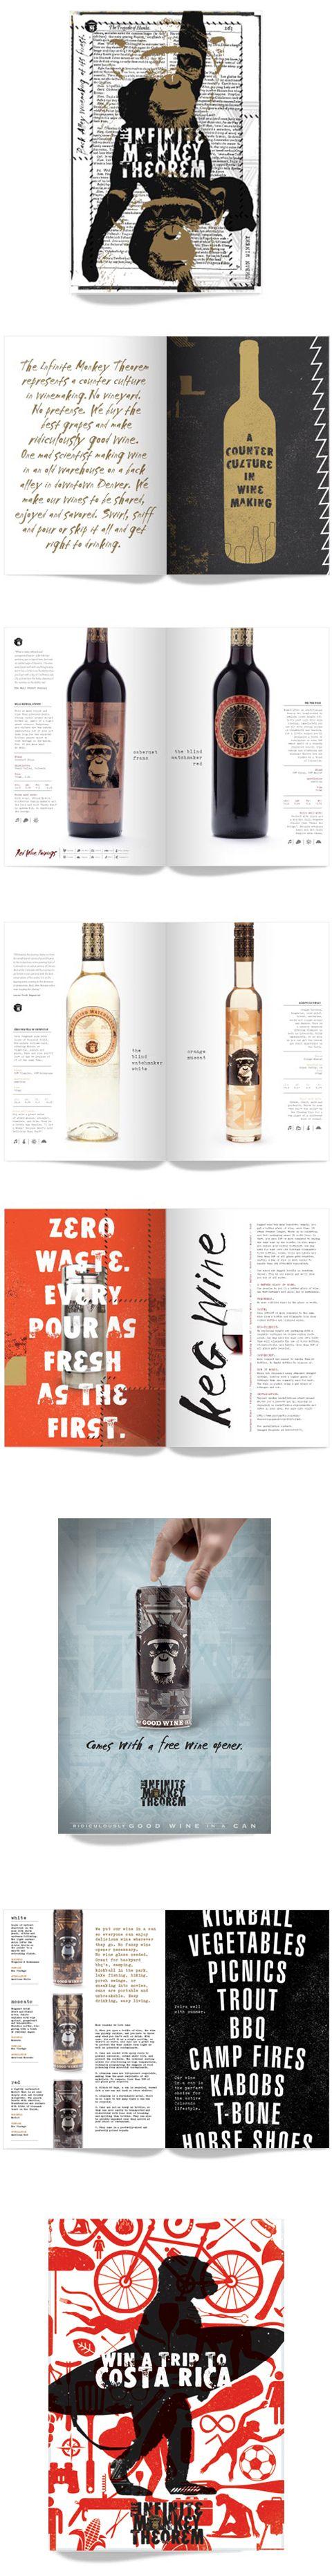 Grit Goes Big-Print to Promote Denver Urban Winery The Infinite Monkey Theorem